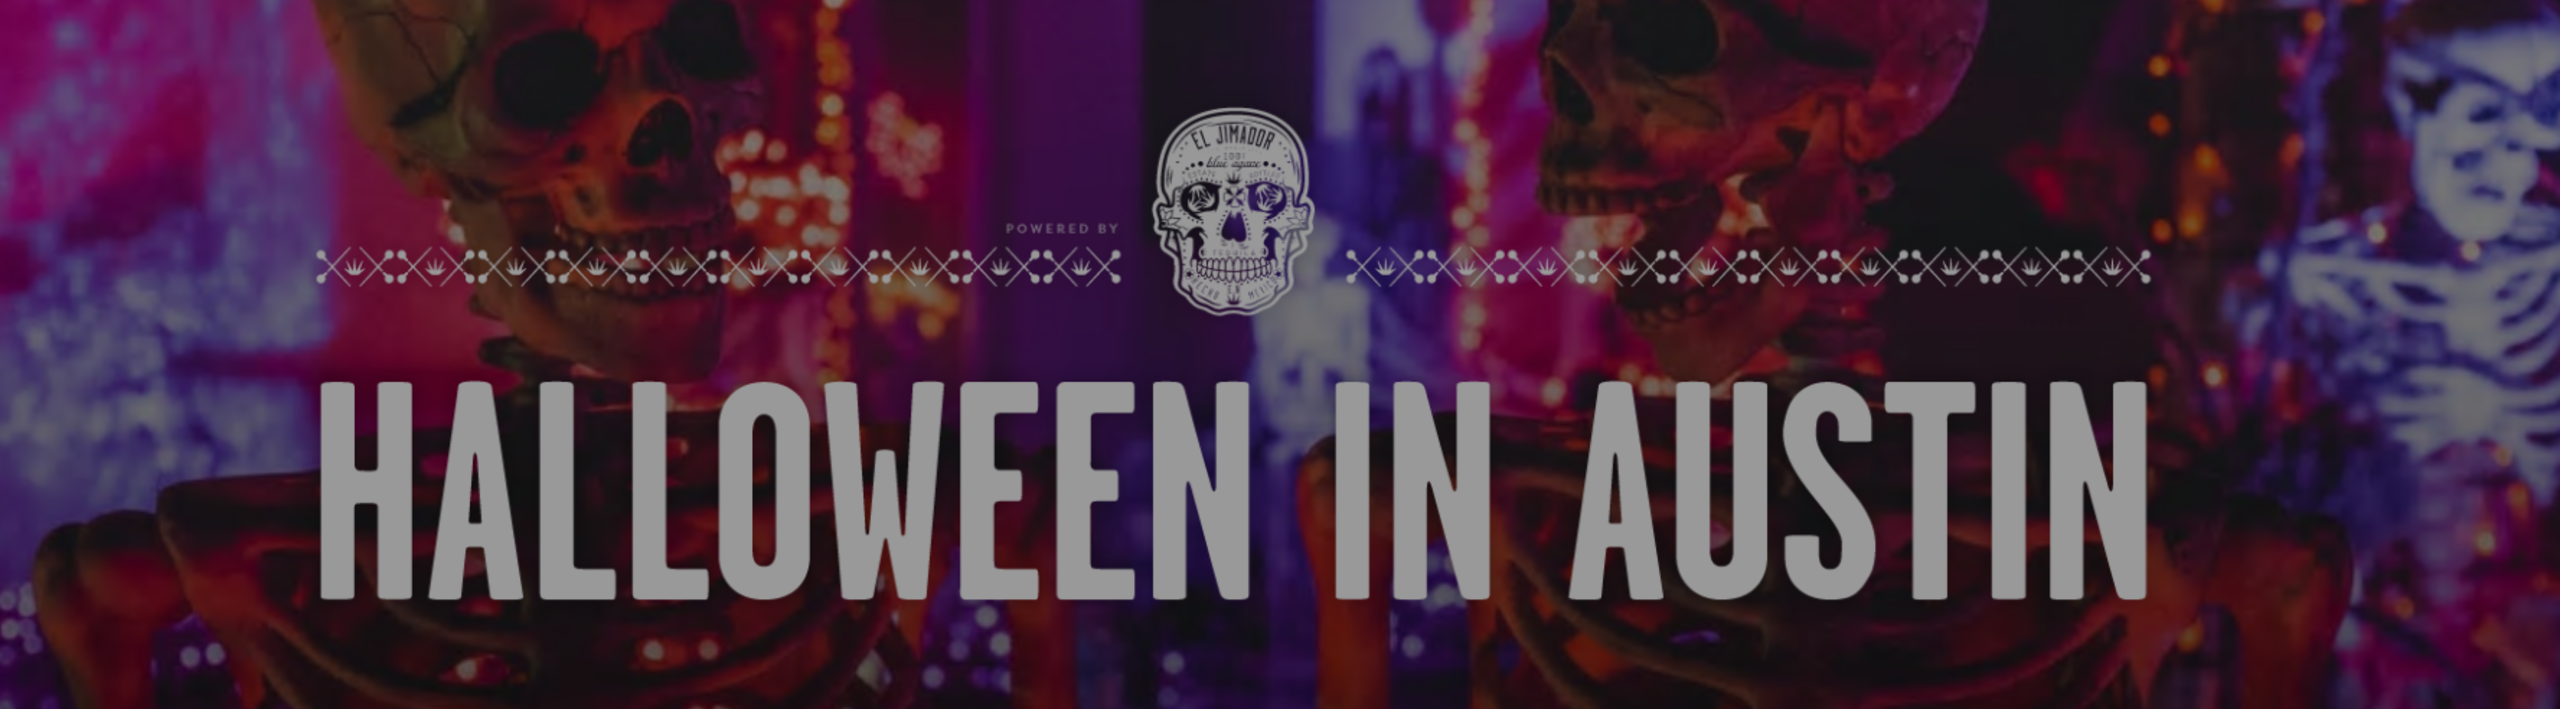 Halloween In Austin